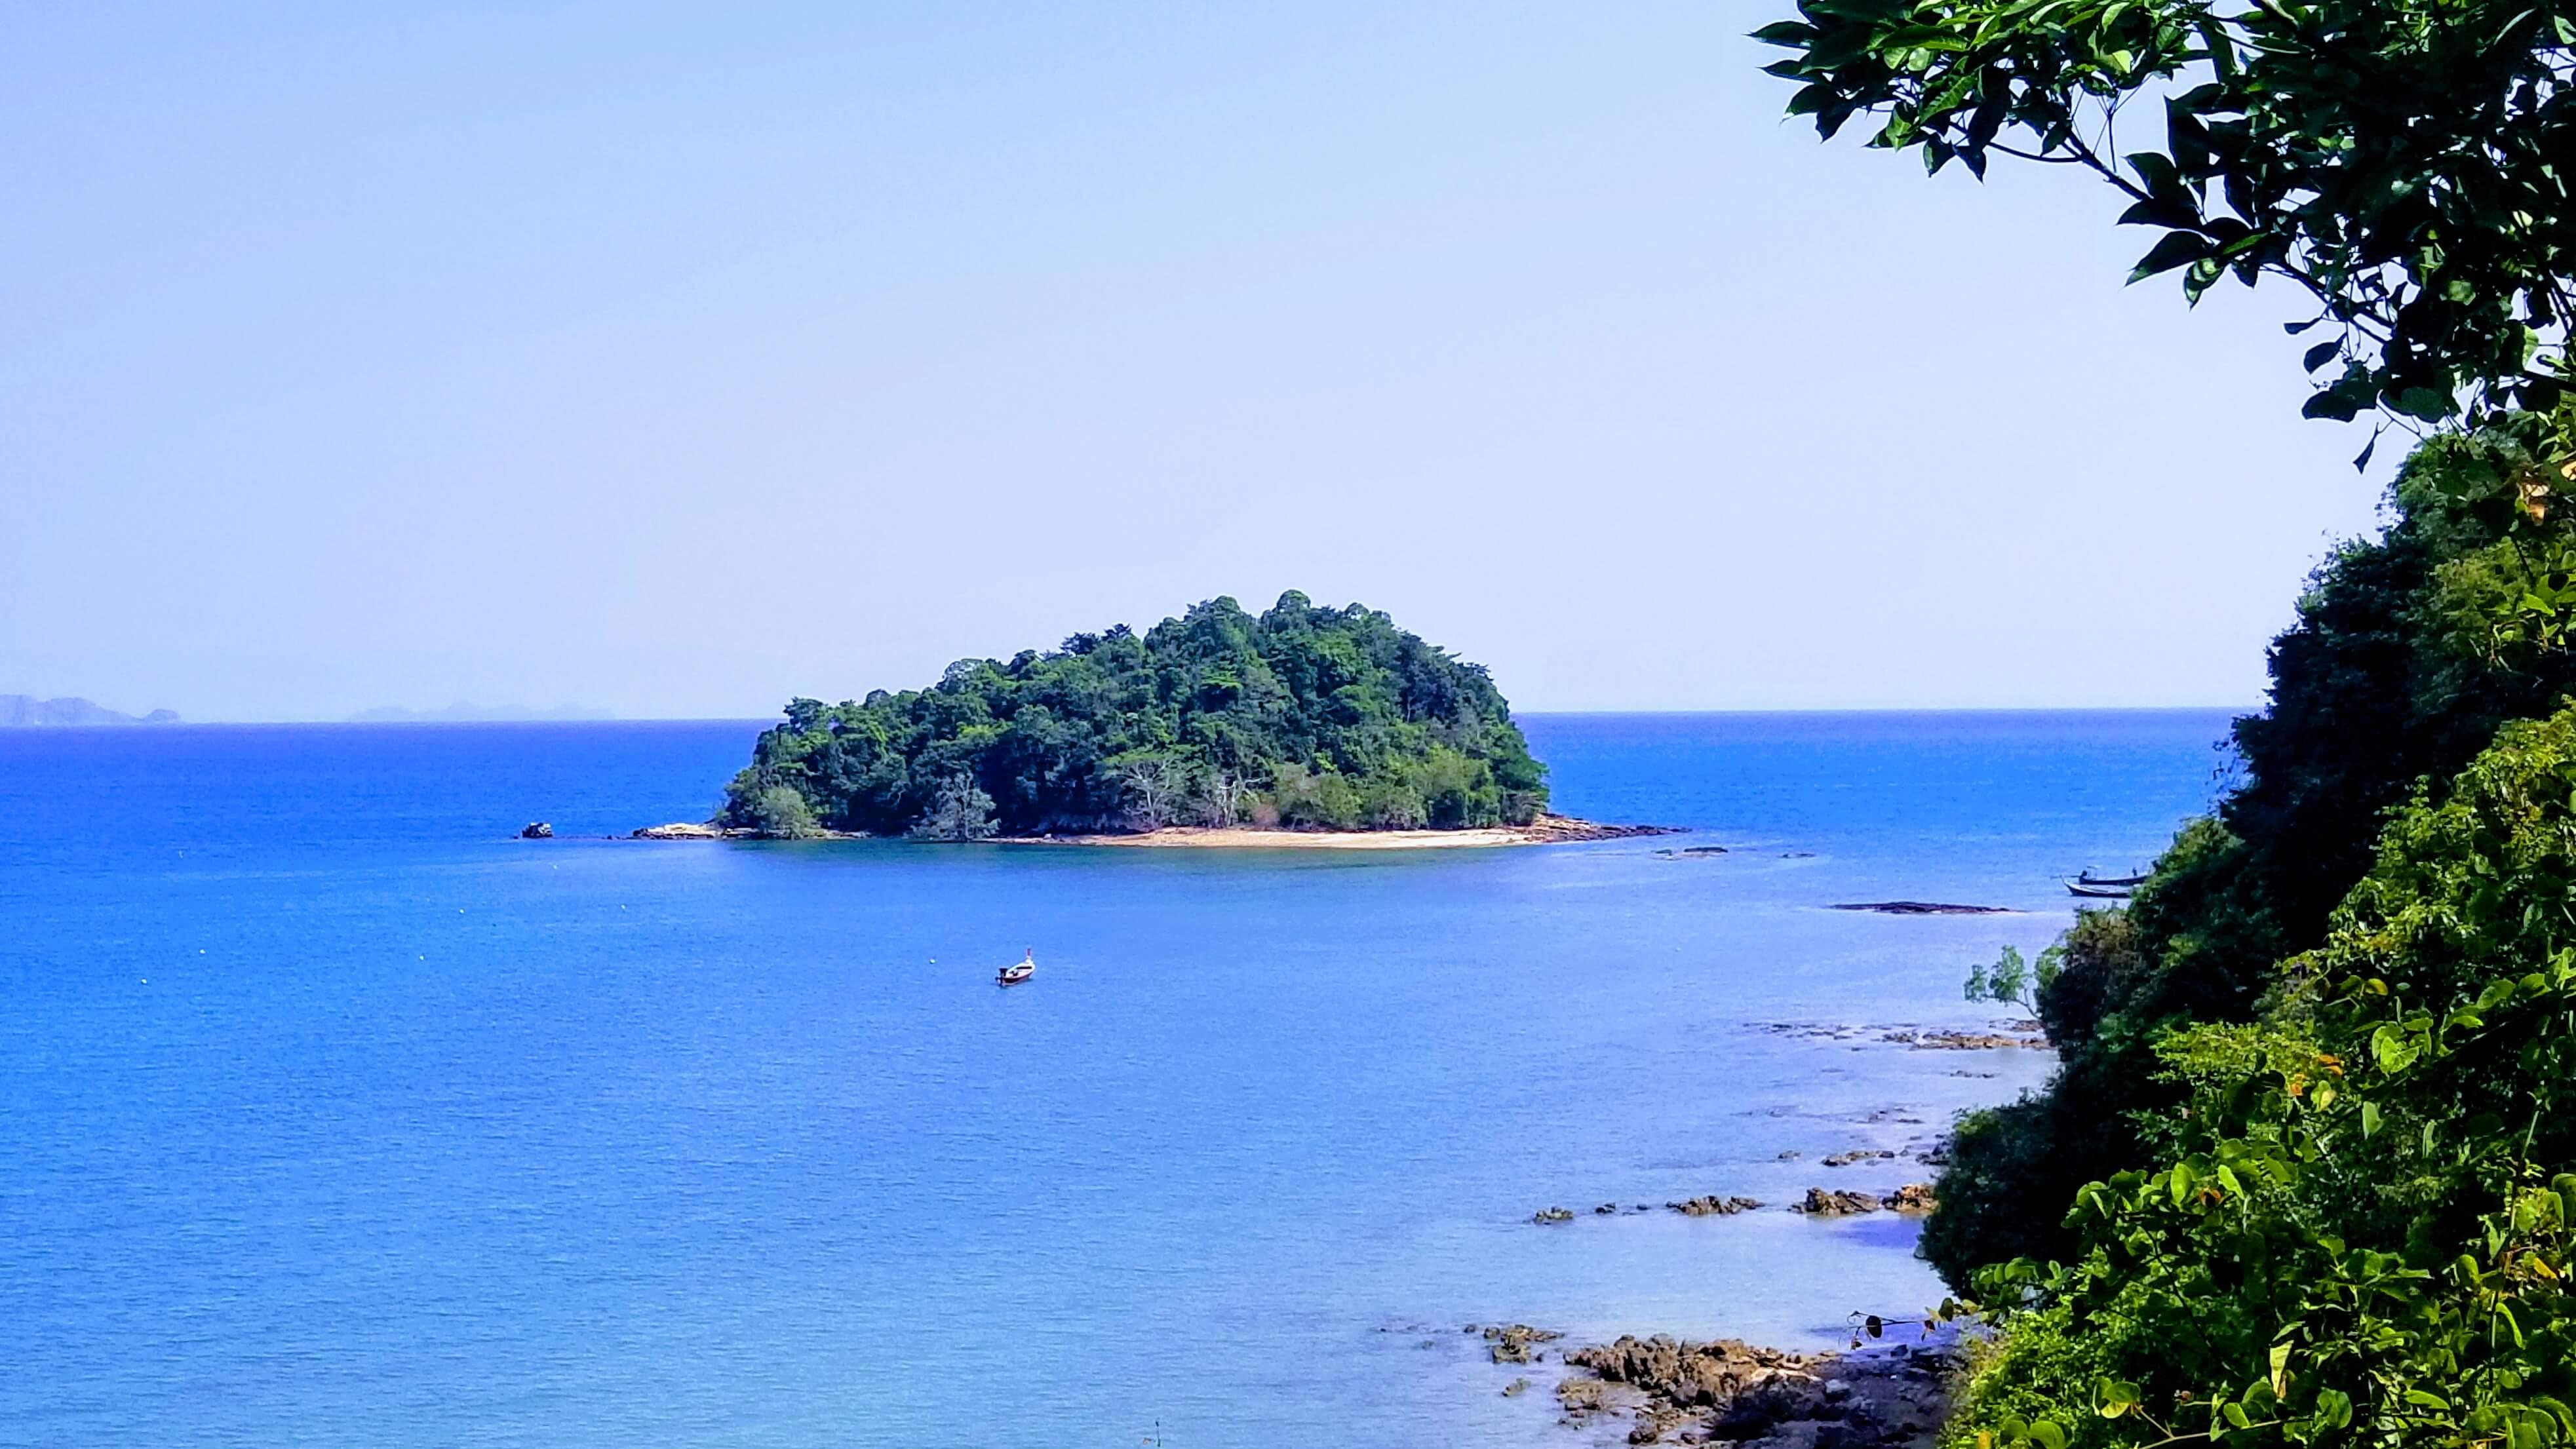 The small island of Ko Po.